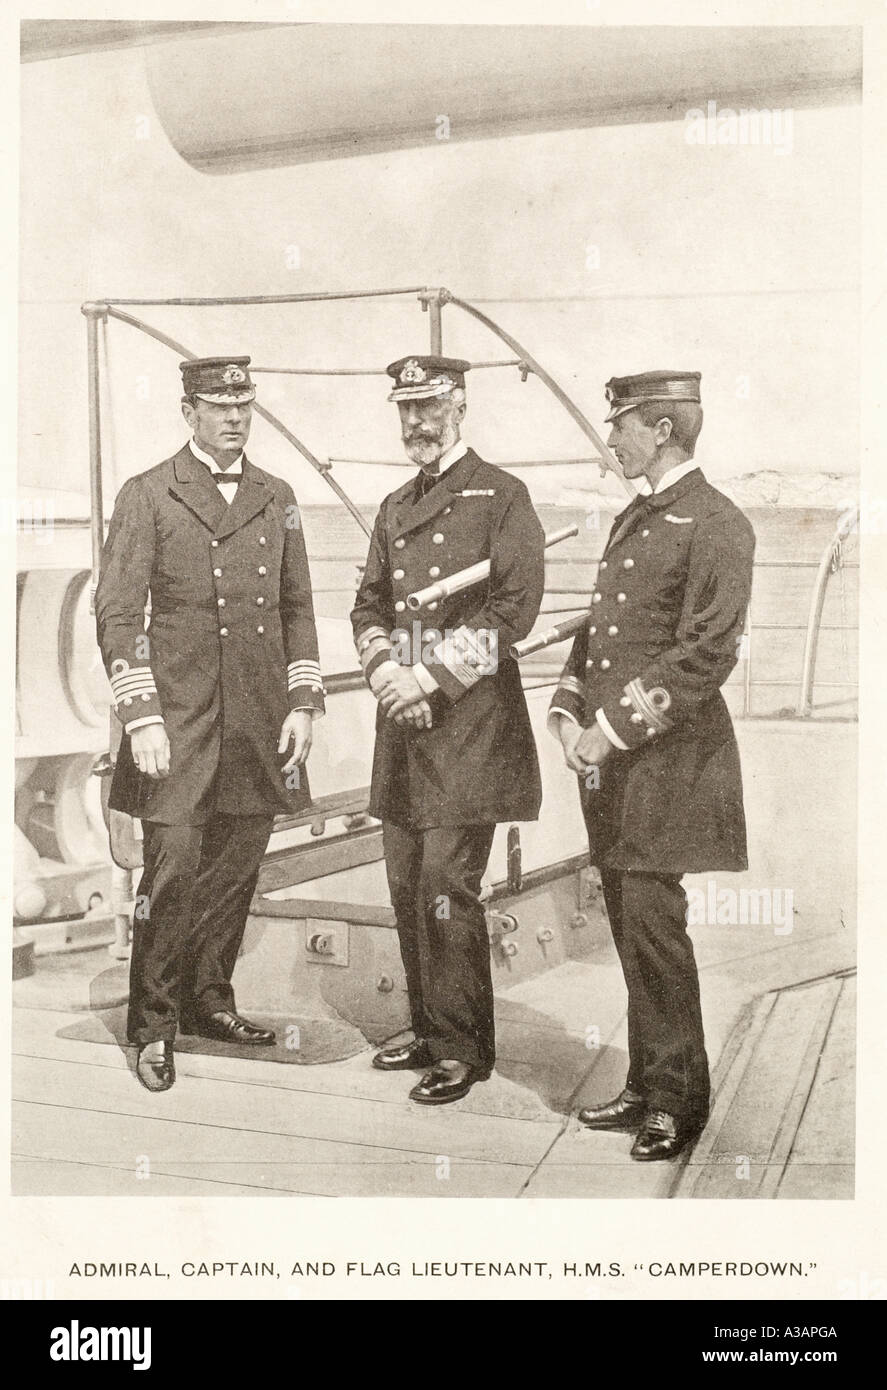 Admiral captain flag lieutenant h m s Camperdown navy naval uniform telescope deck battleship British Royal fleet sailor command - Stock Image